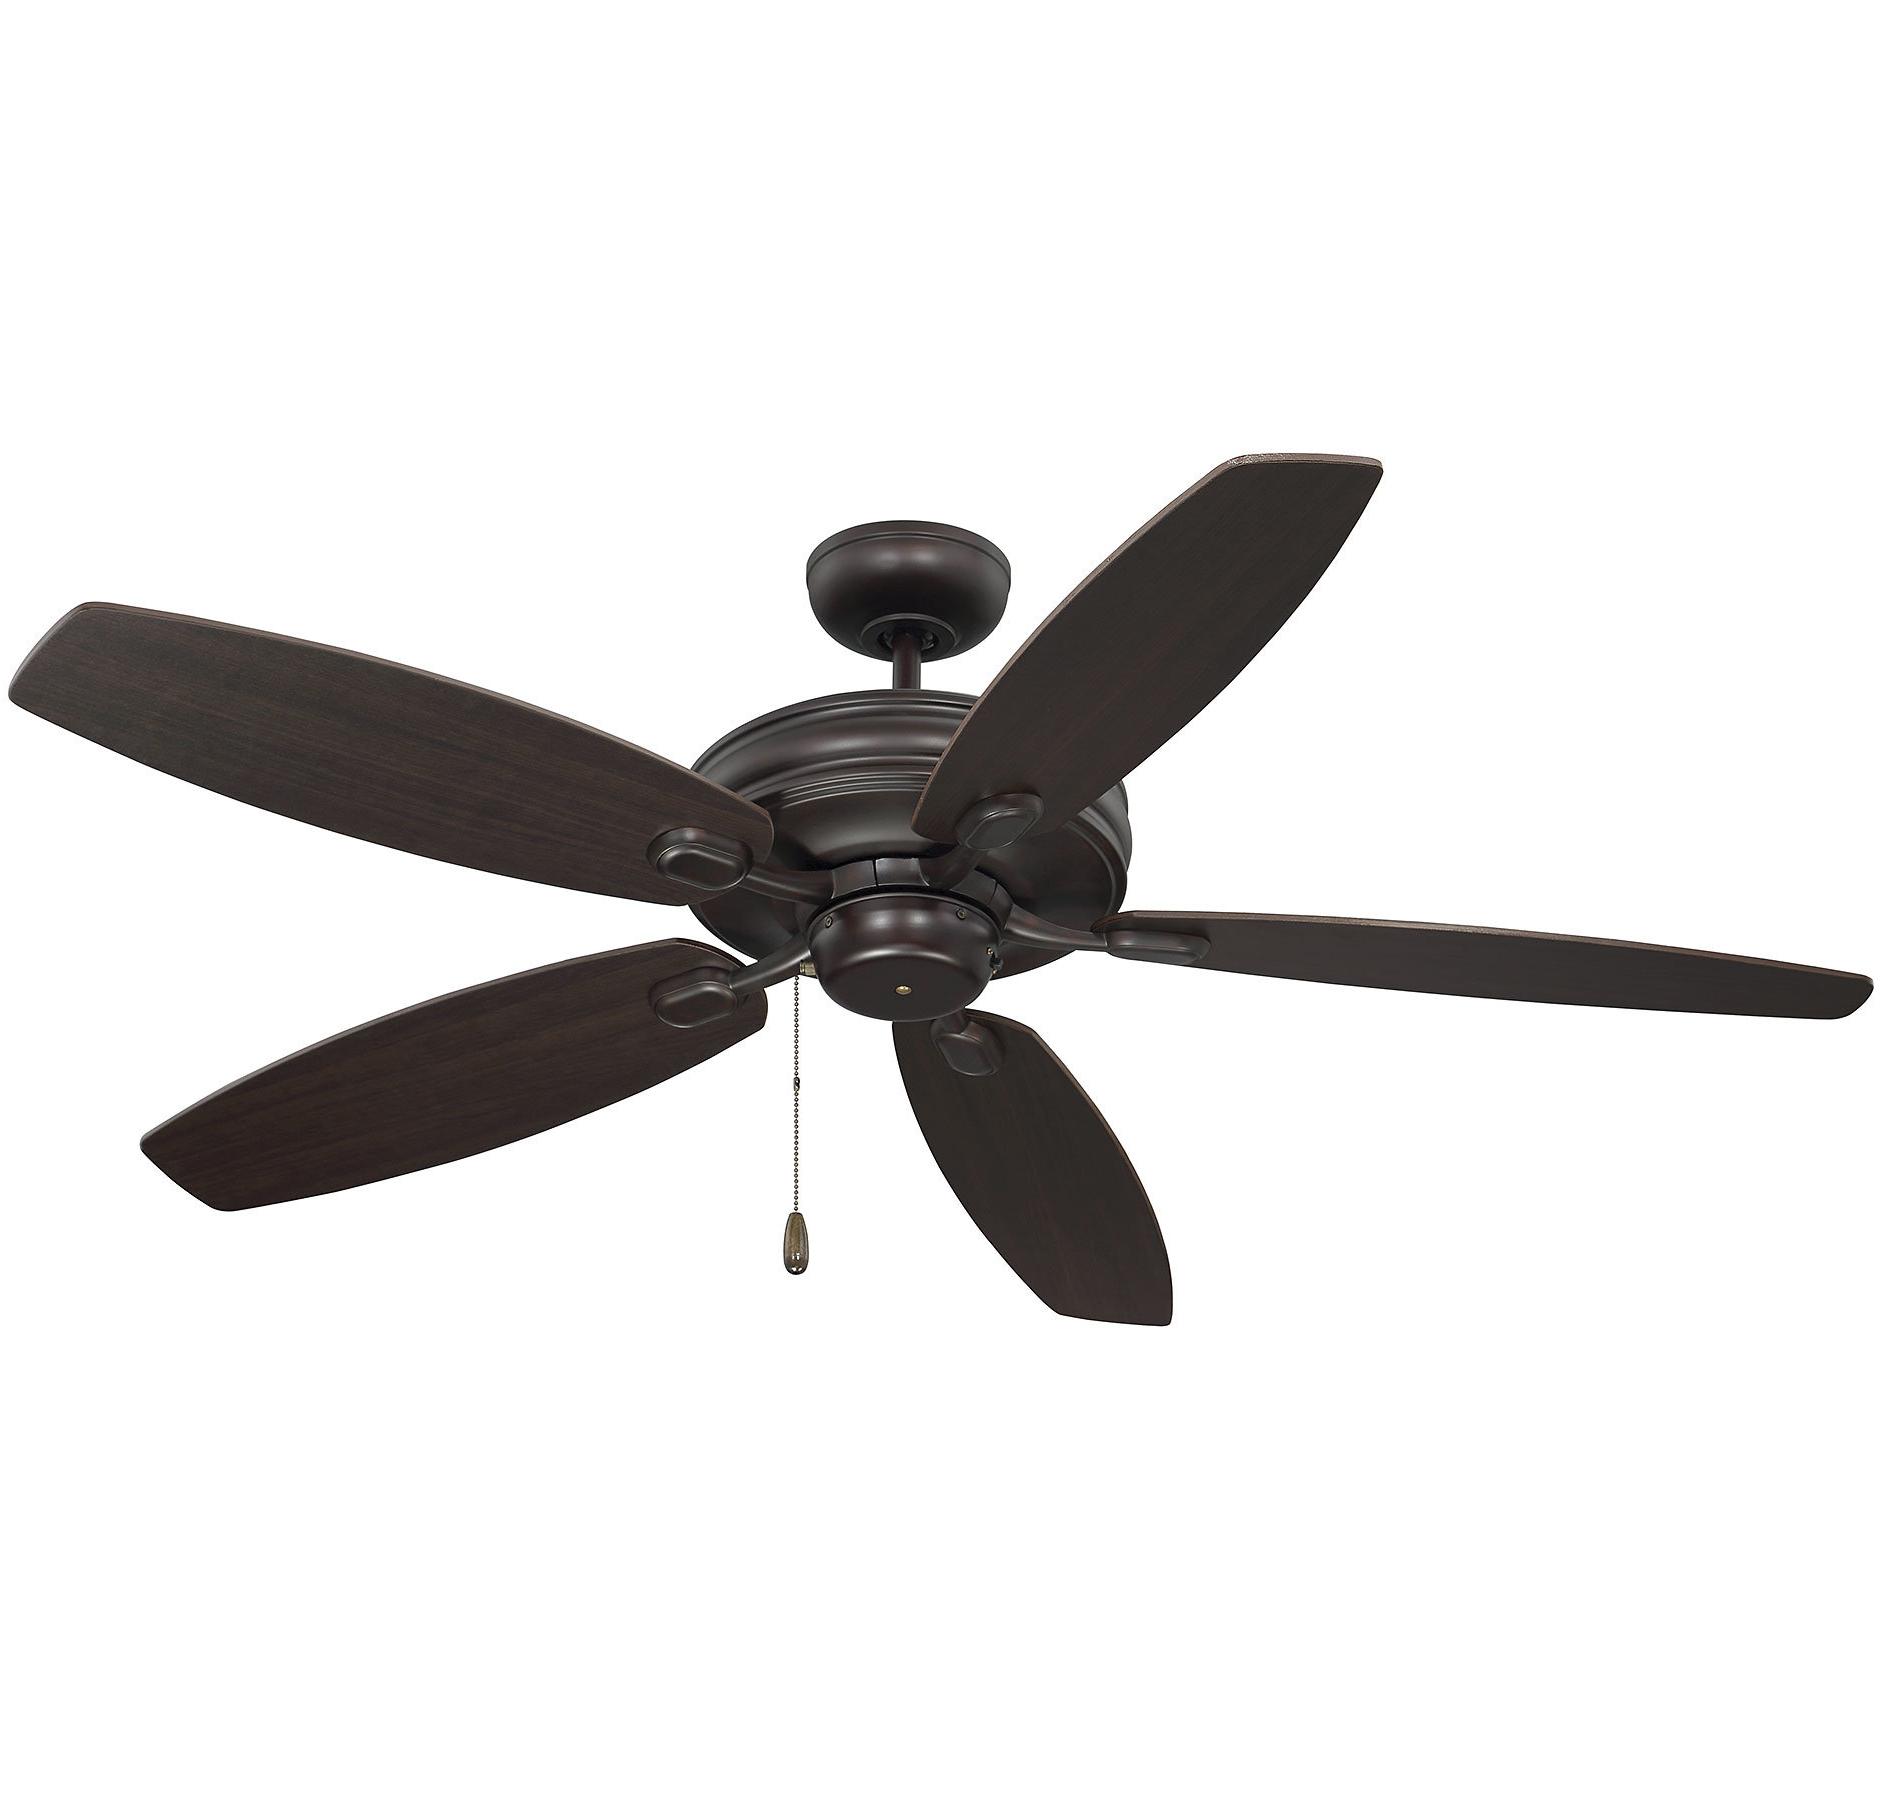 "Kalea 5 Blade Outdoor Ceiling Fans Throughout Preferred Genevie 52"" Kentwood 5 Blade Ceiling Fan (View 12 of 20)"